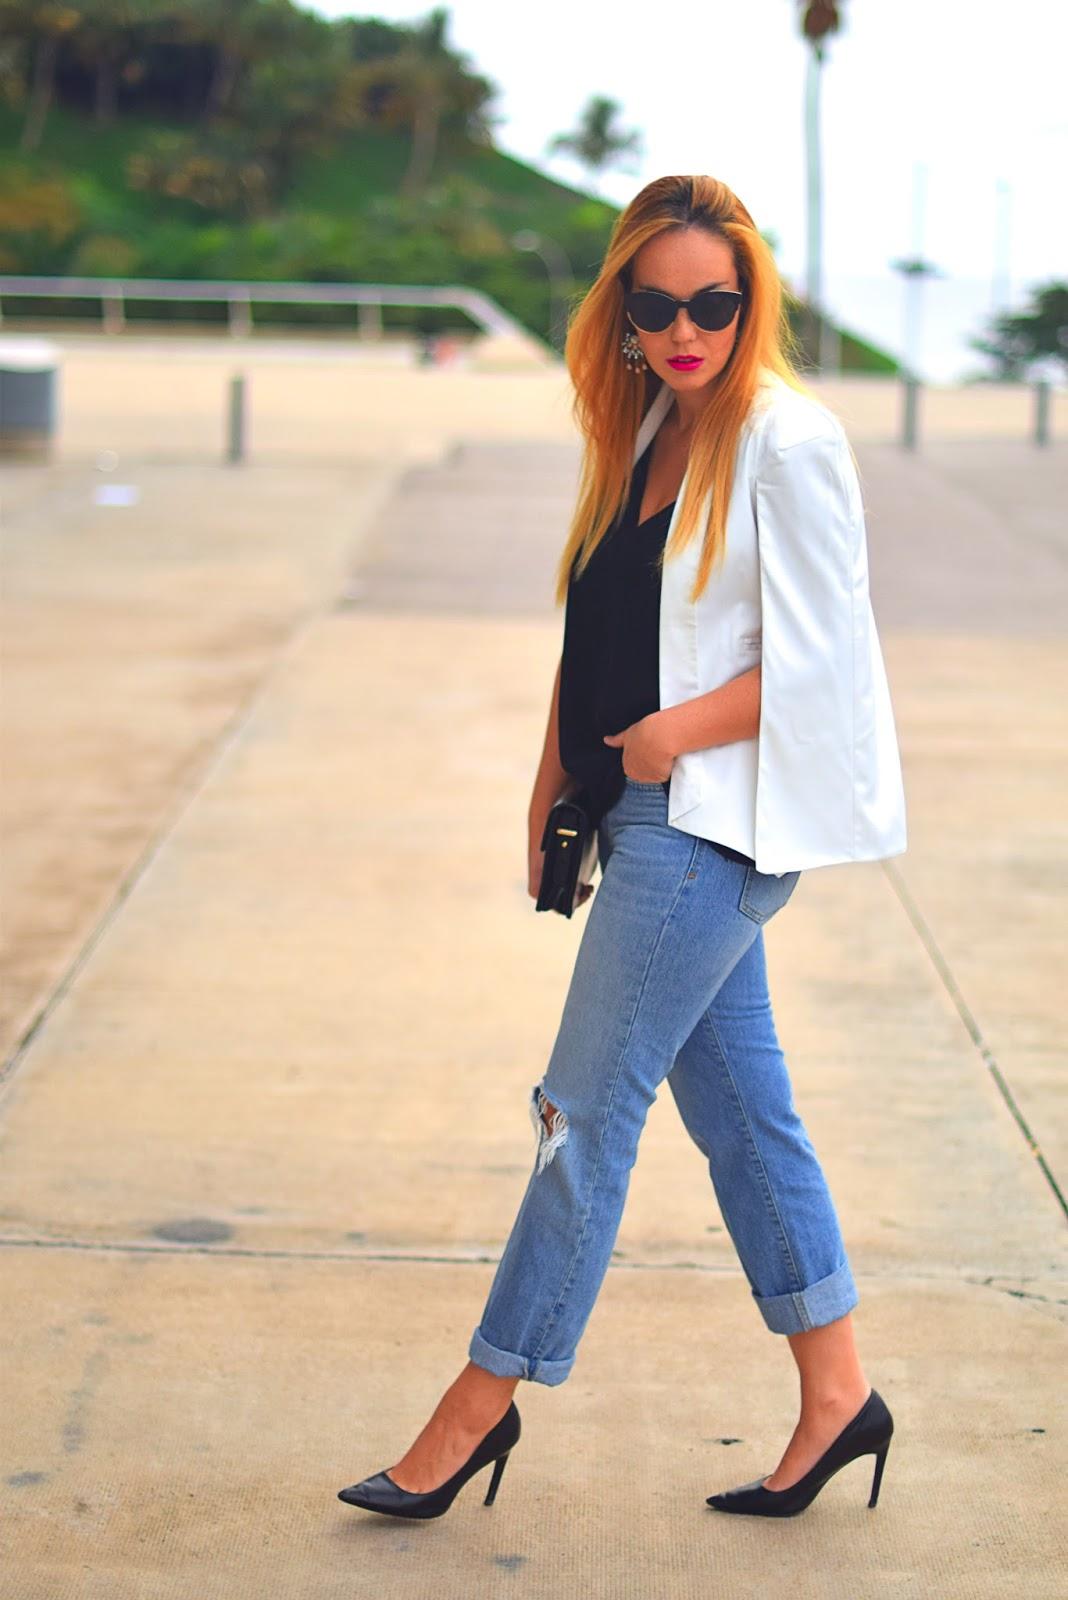 nery hdez, yoins, dior sidereal 1 , optical h, cape blazer, choies, boyfriend jeans